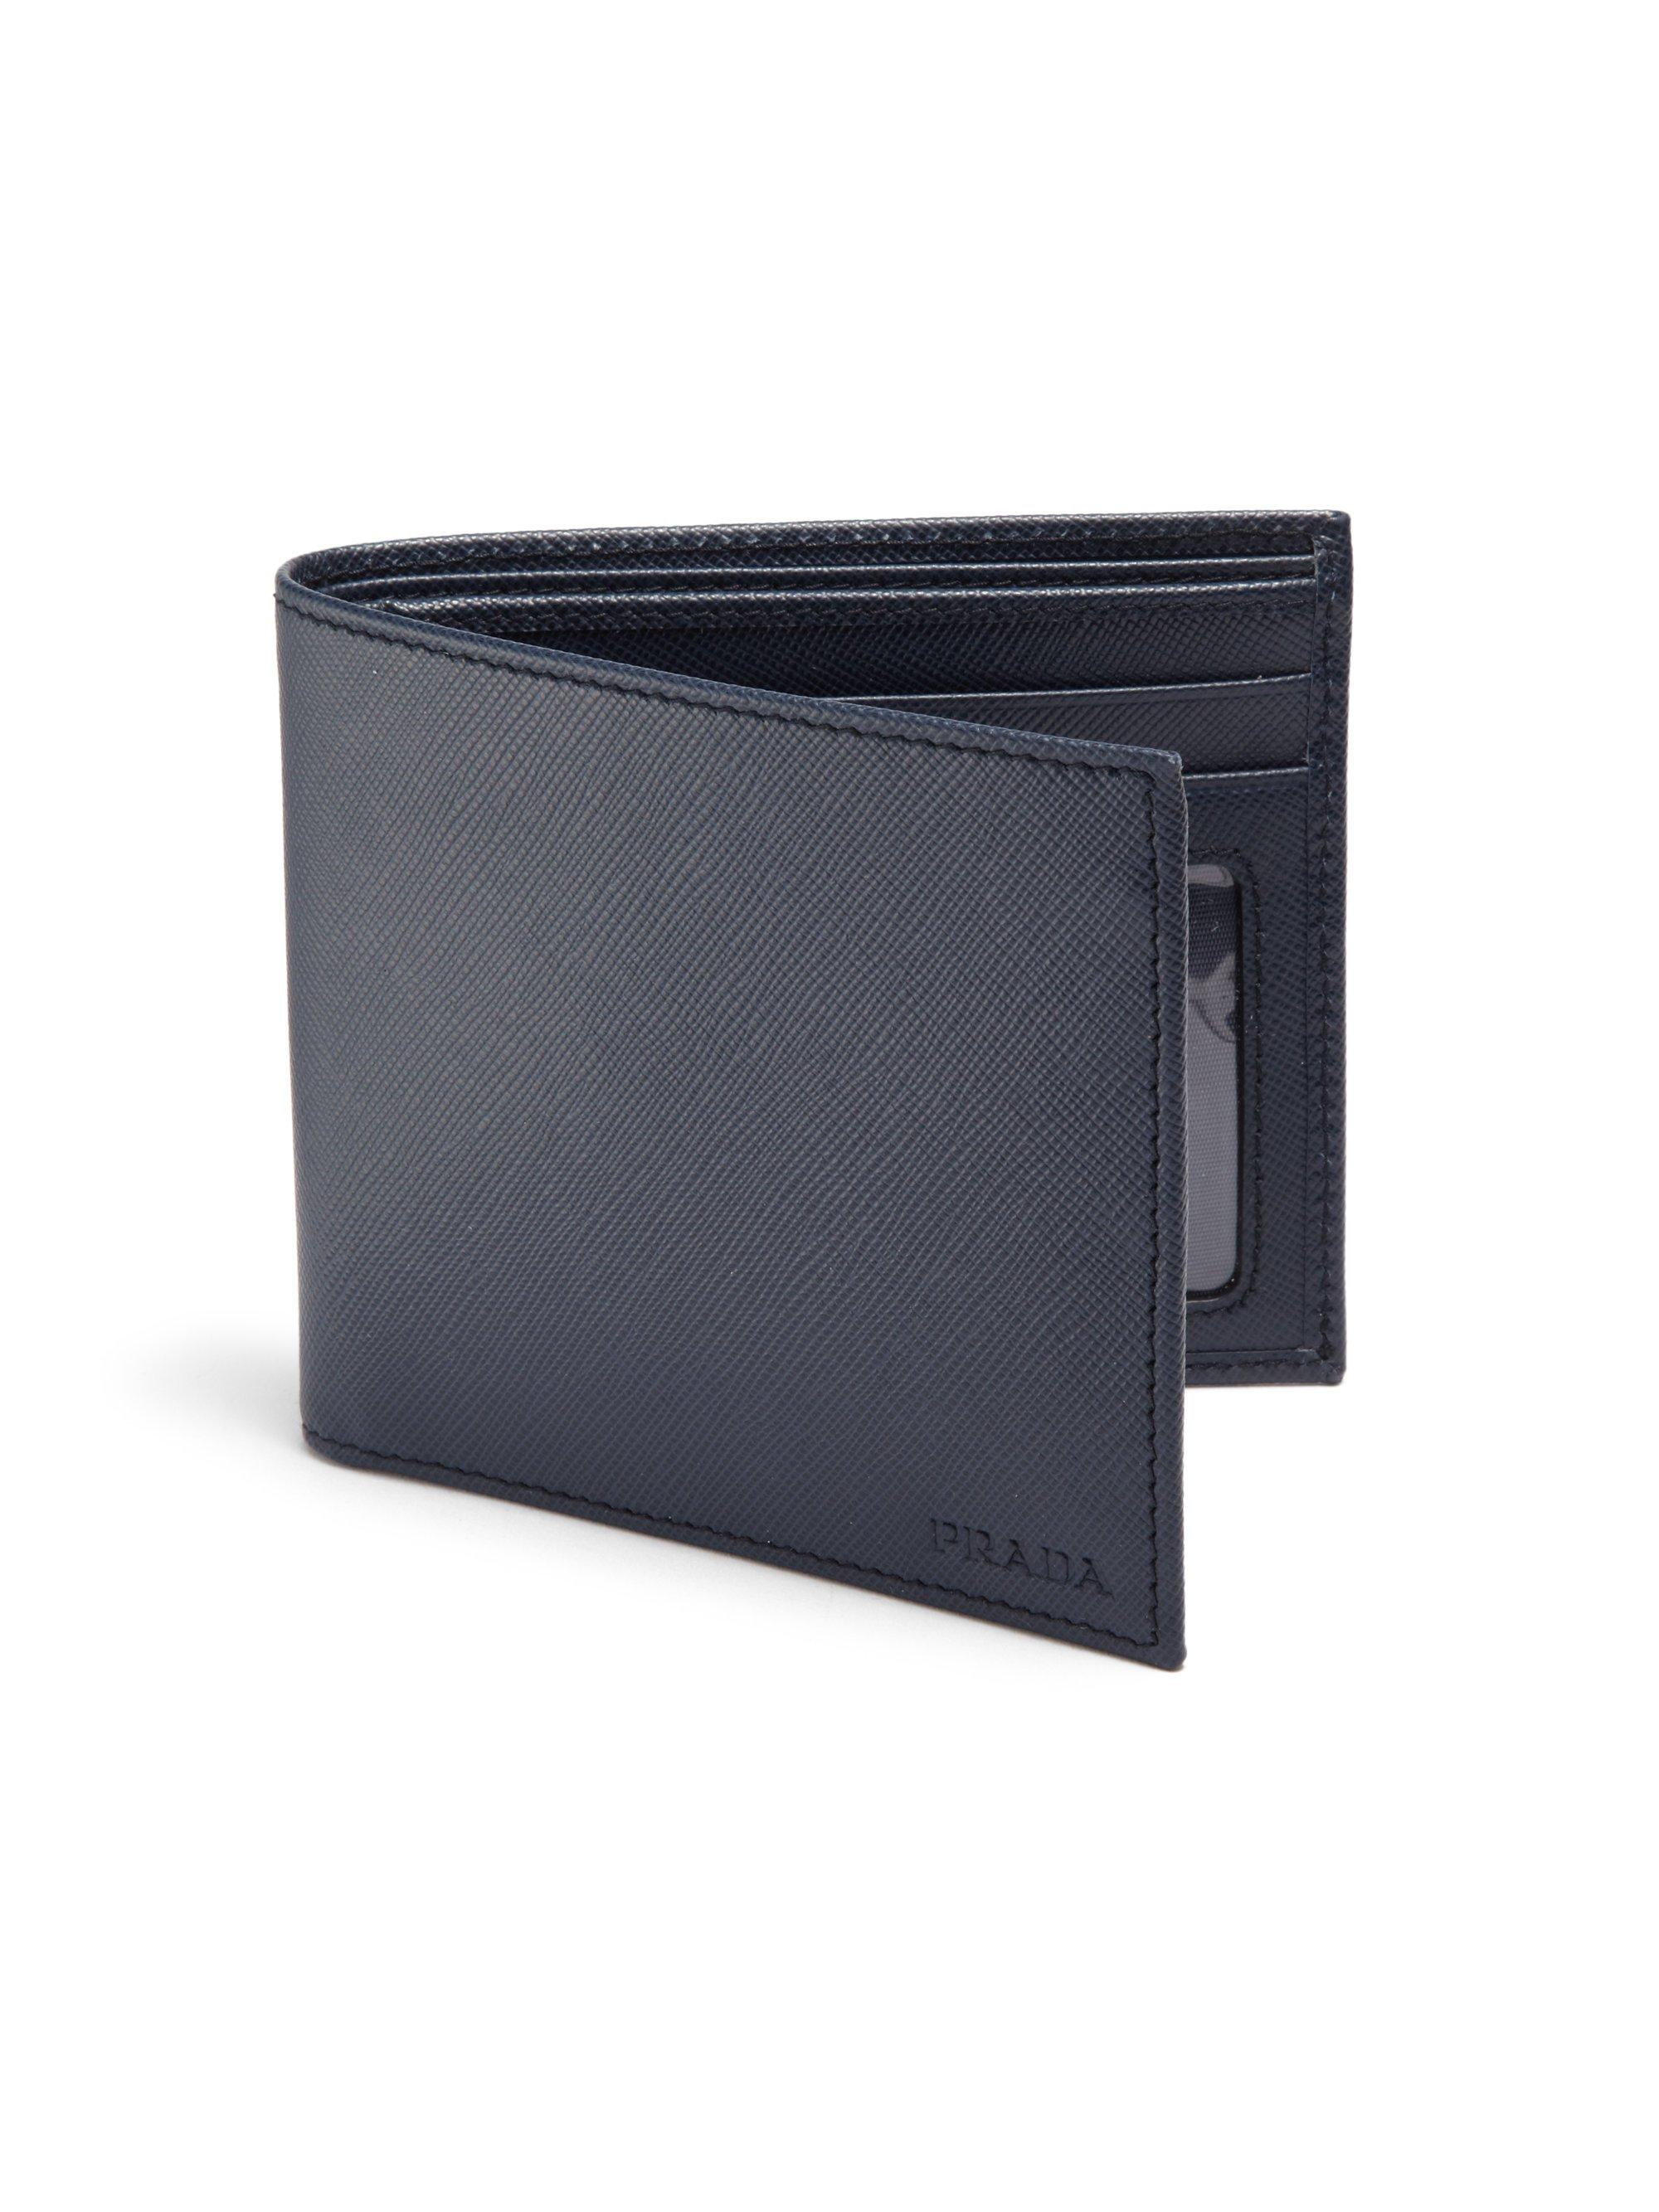 Prada Saffiano Leather Billfold Wallet in Black for Men | Lyst